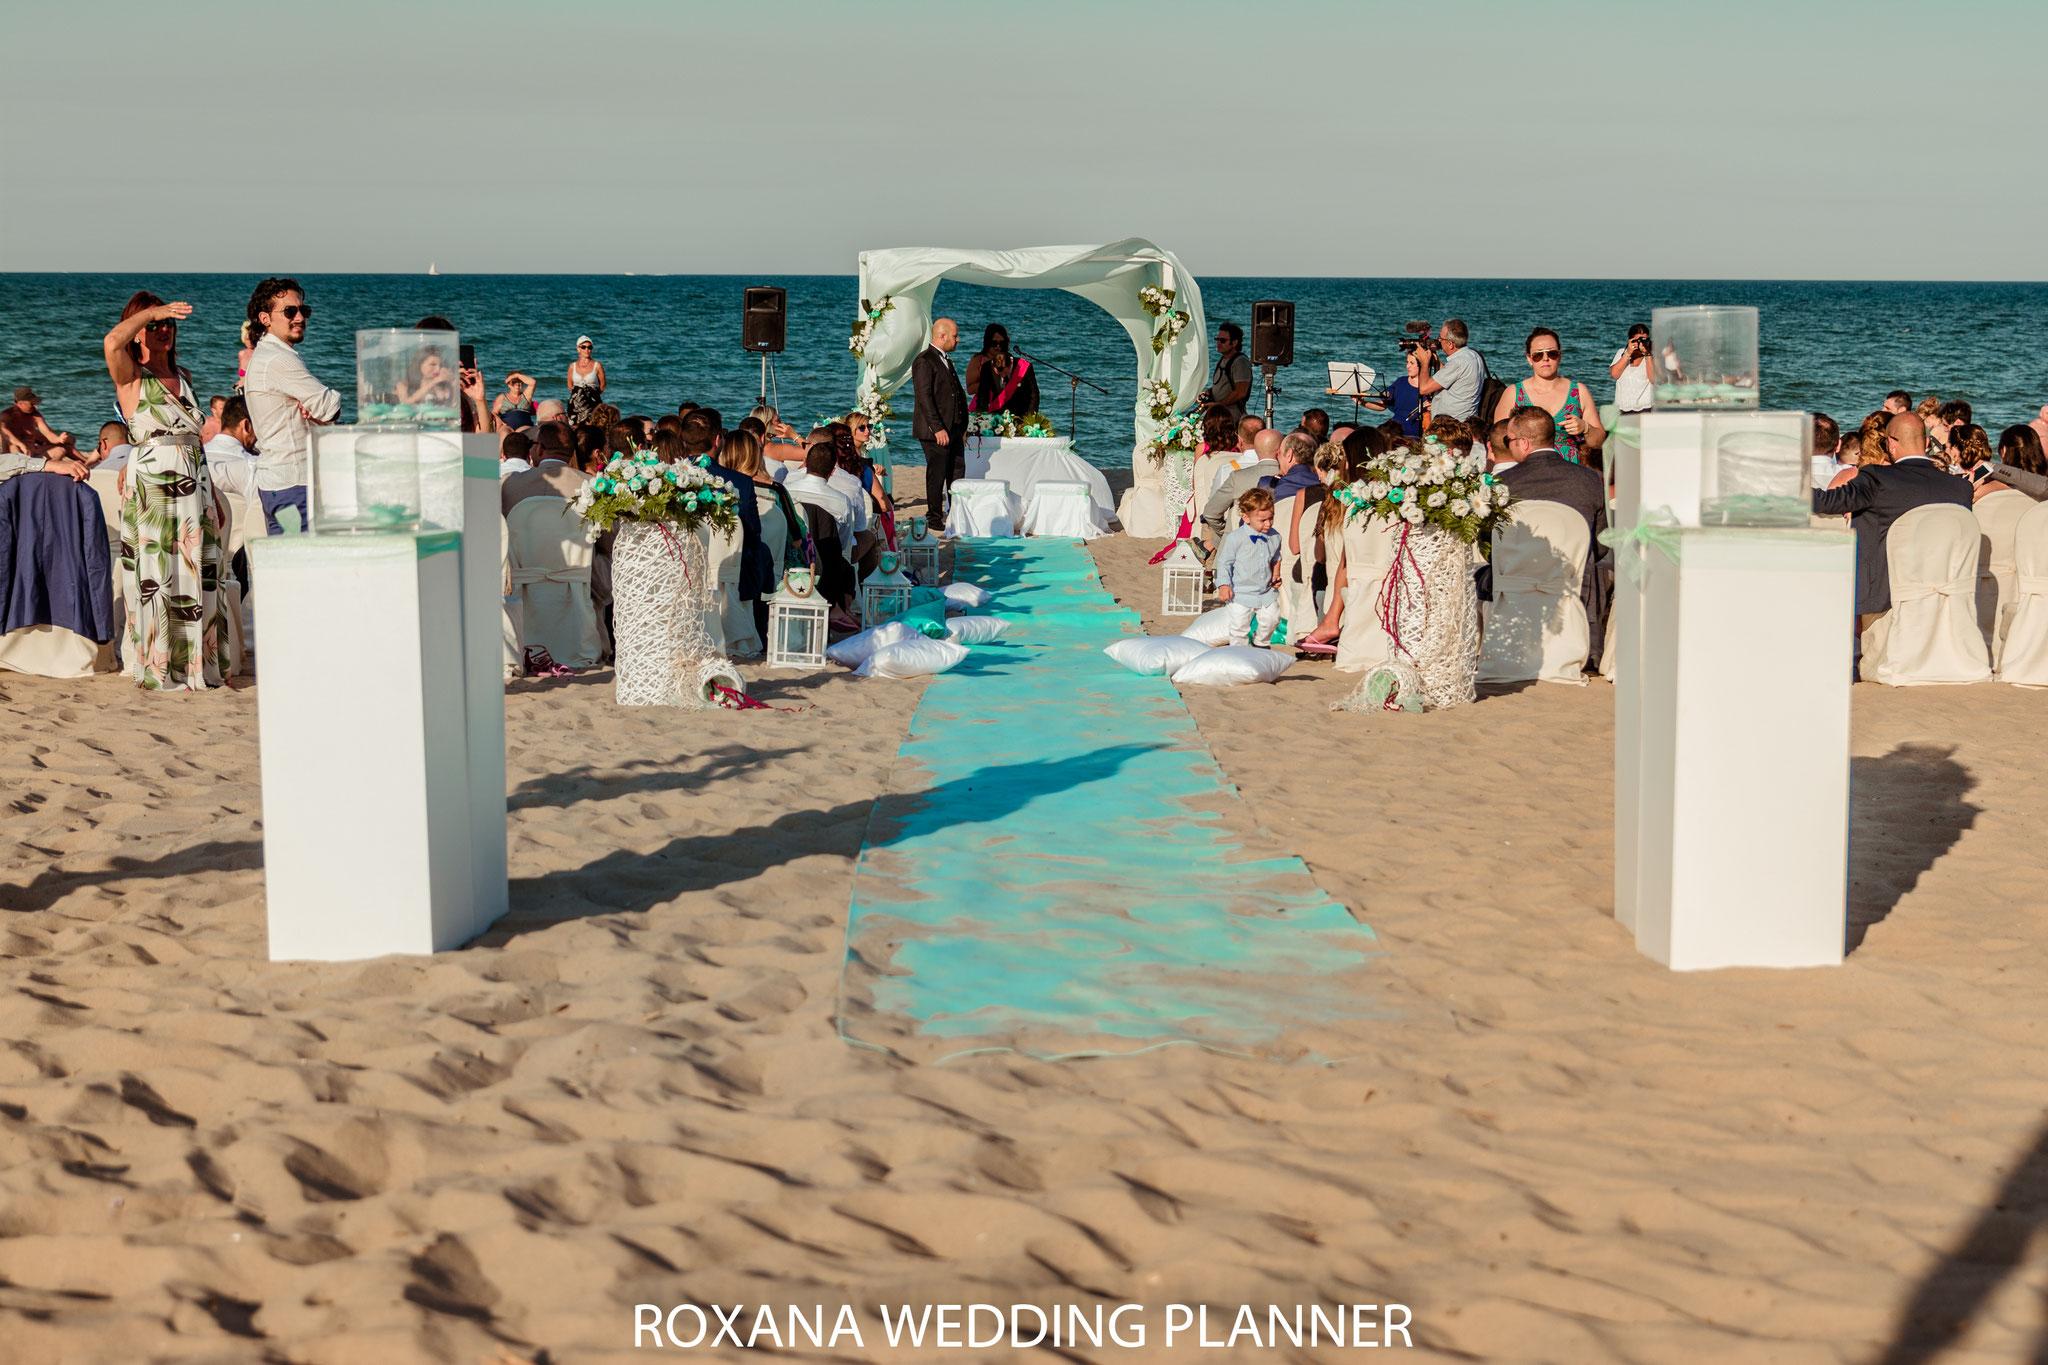 Matrimonio Spiaggia Catania : Matrimonio in spiaggia sicilia beach wedding roxana